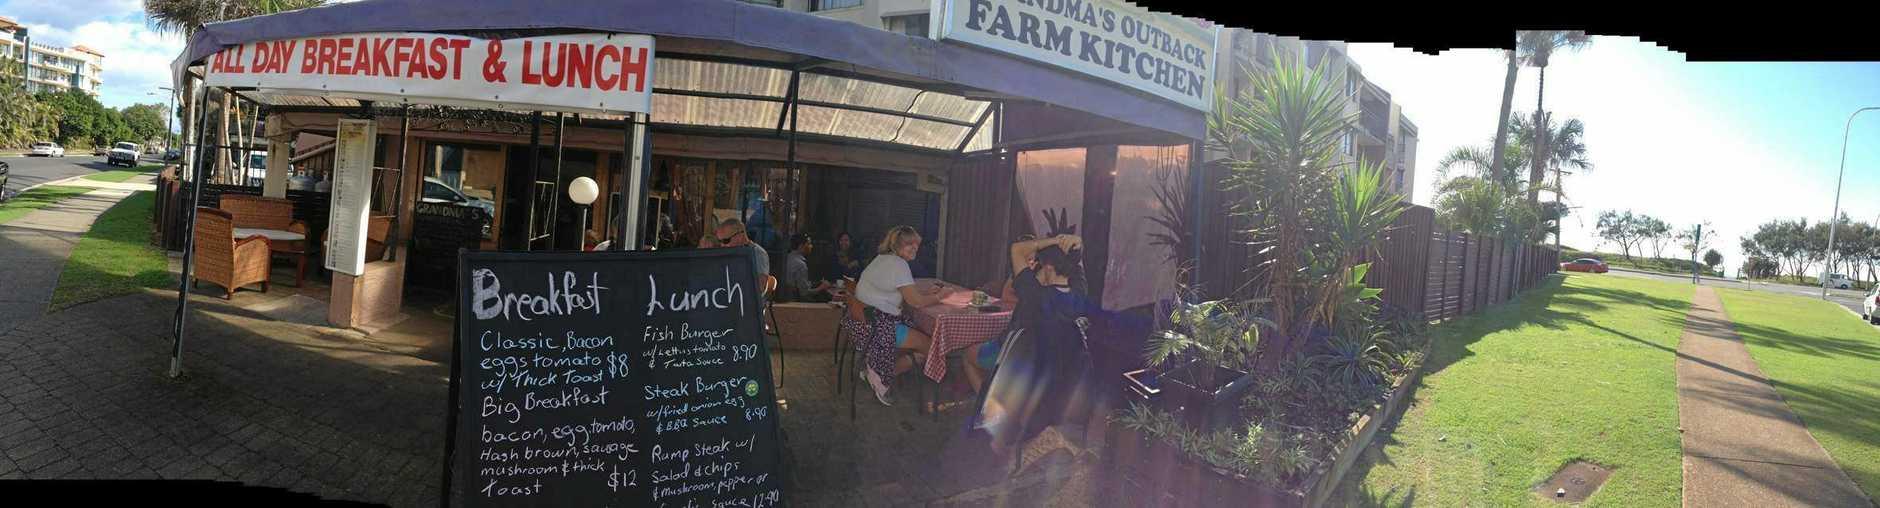 Grandma's Outback Farm Kitchen was on Maroubra St, Alexandra Headland